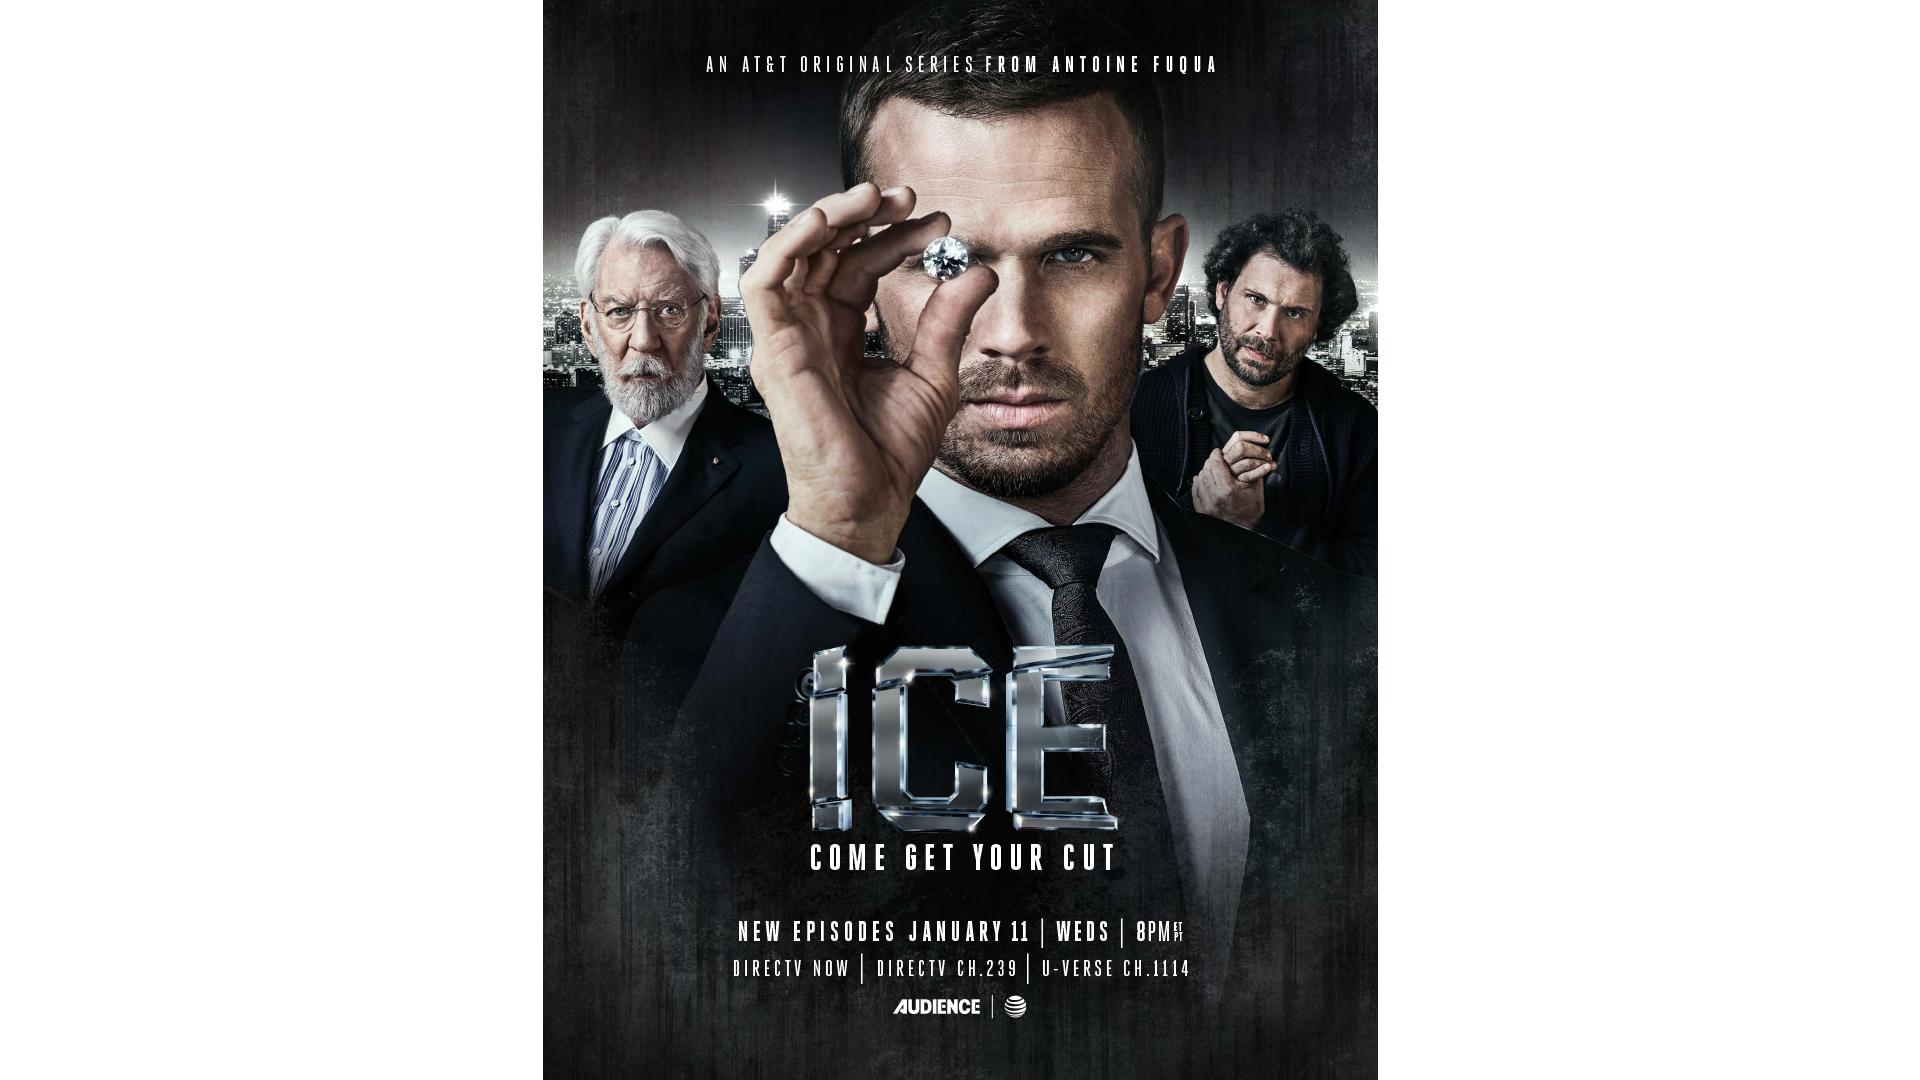 Ice_02-2-2.jpg